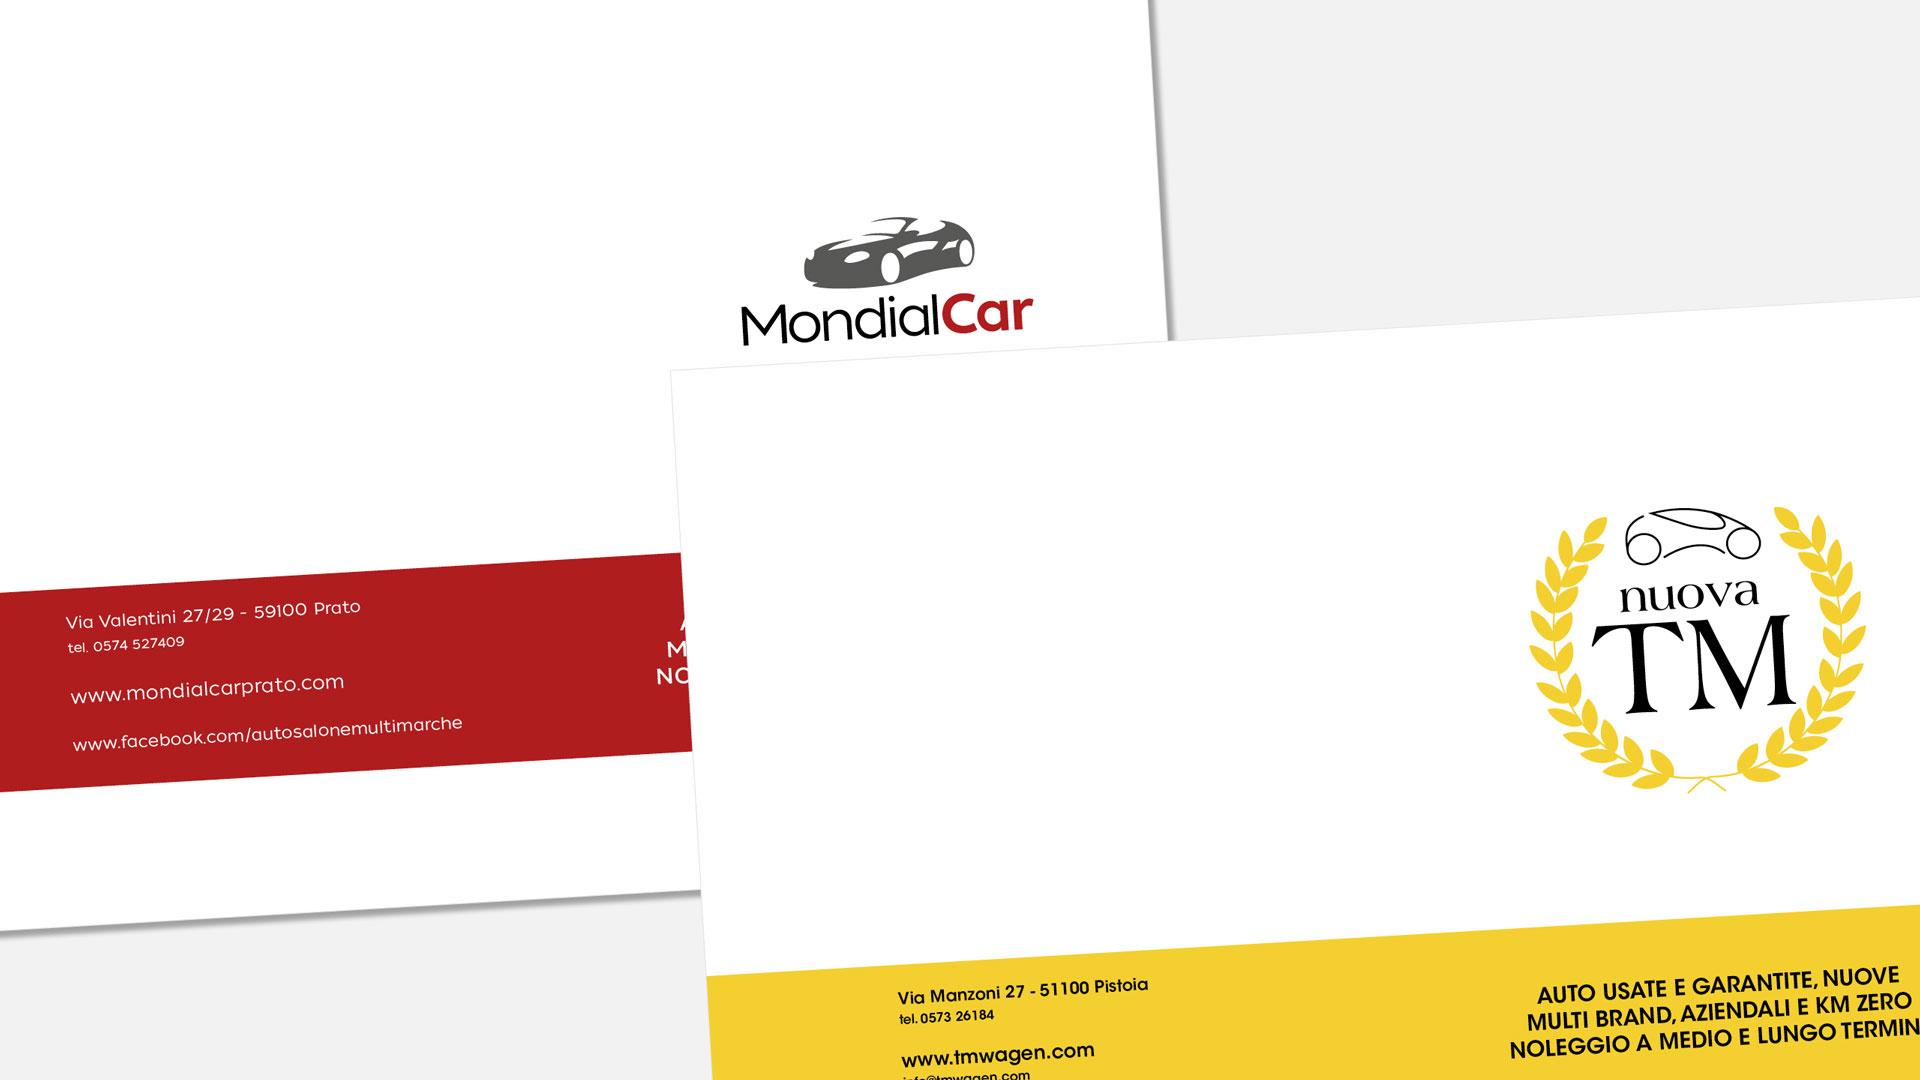 Nuova TM - MondialCar